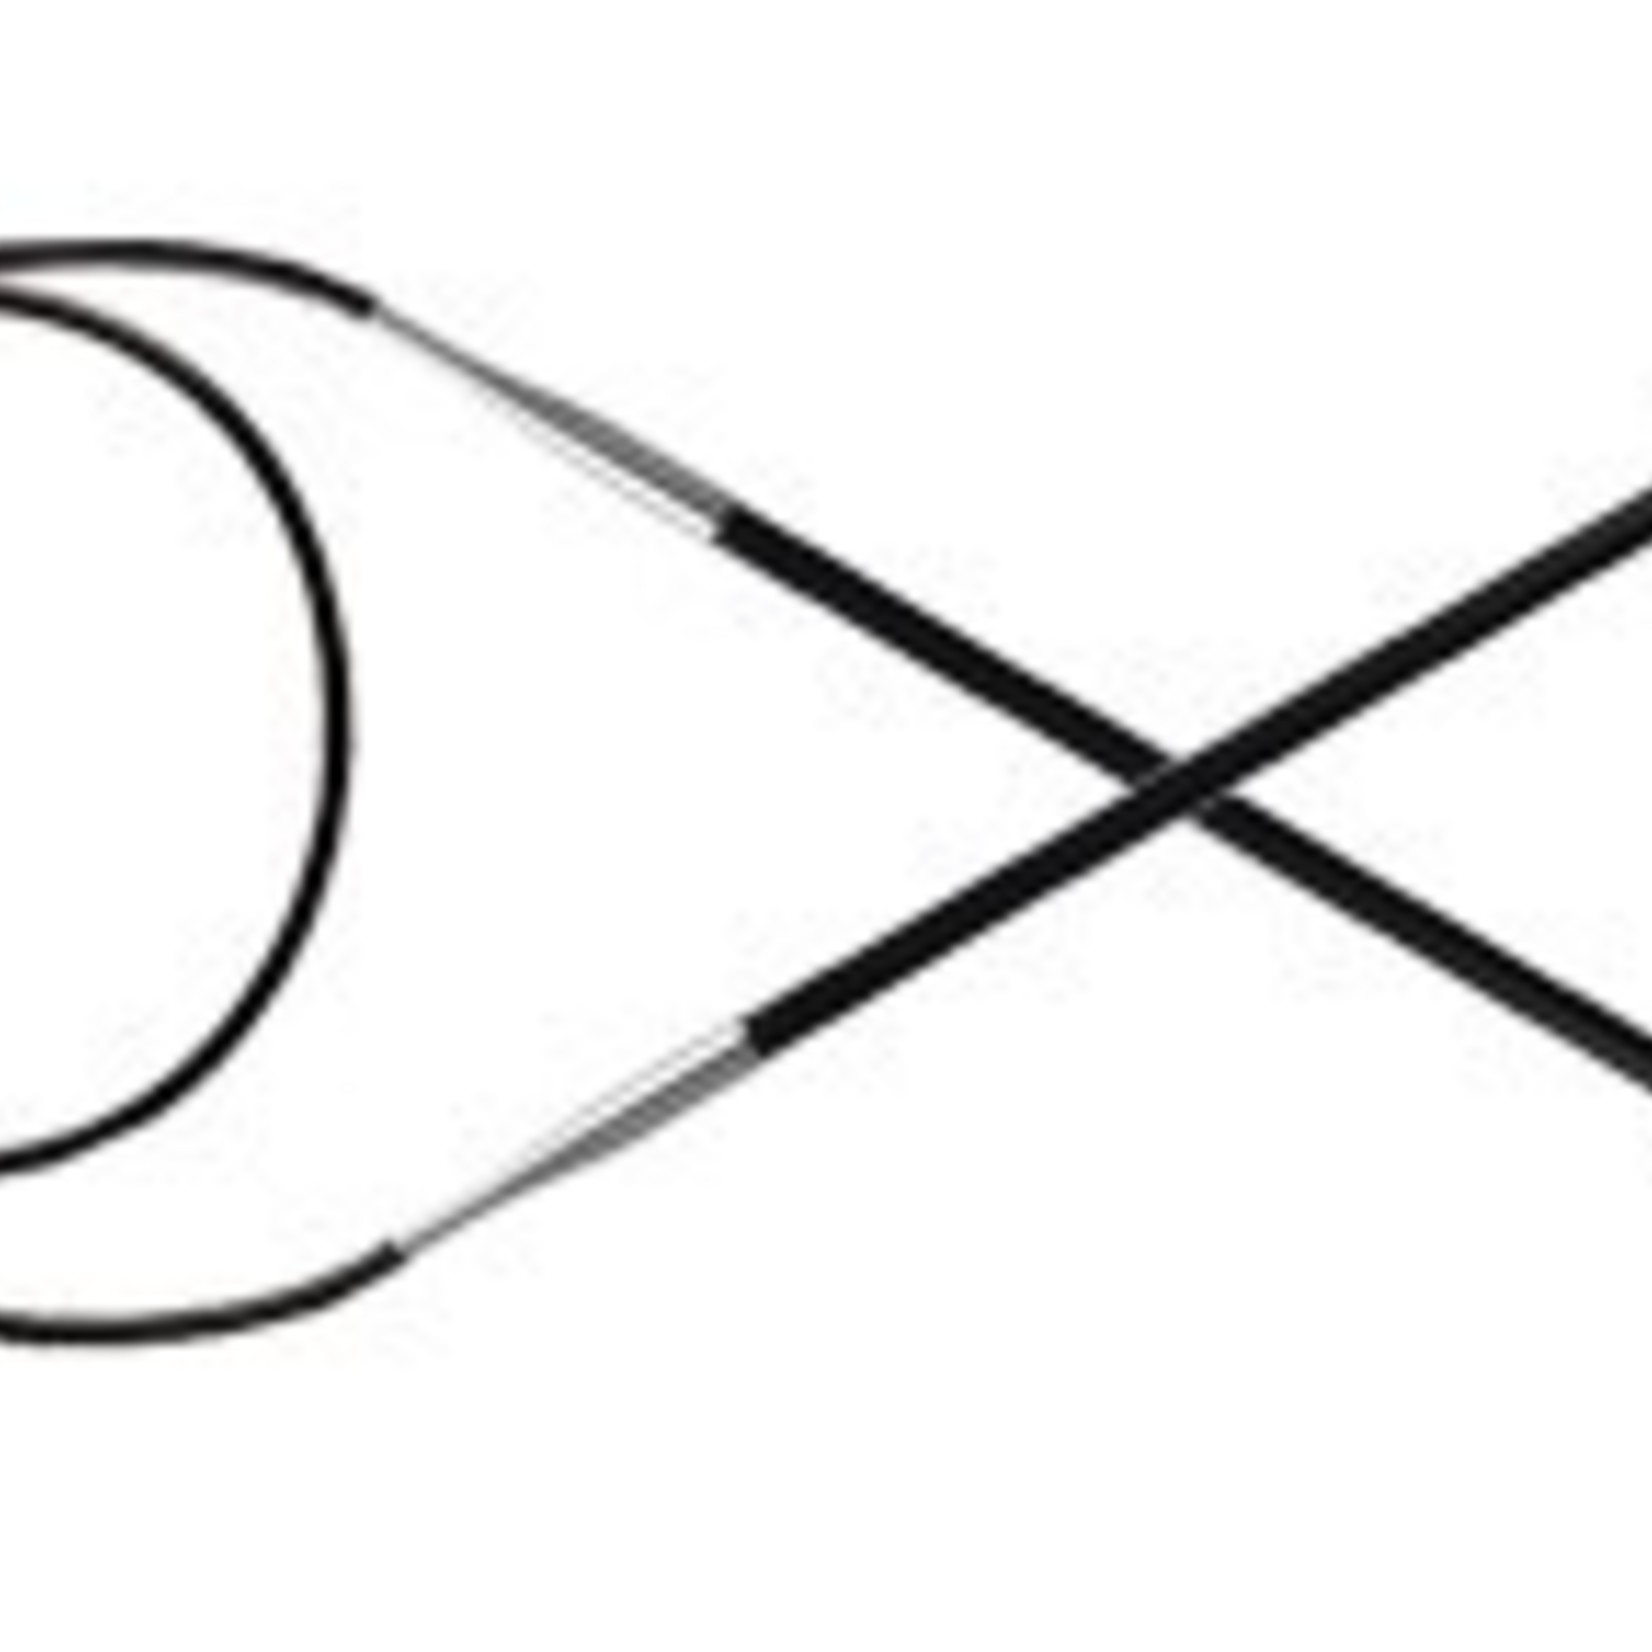 Knitter's Pride 11 Karbonz Circular 40